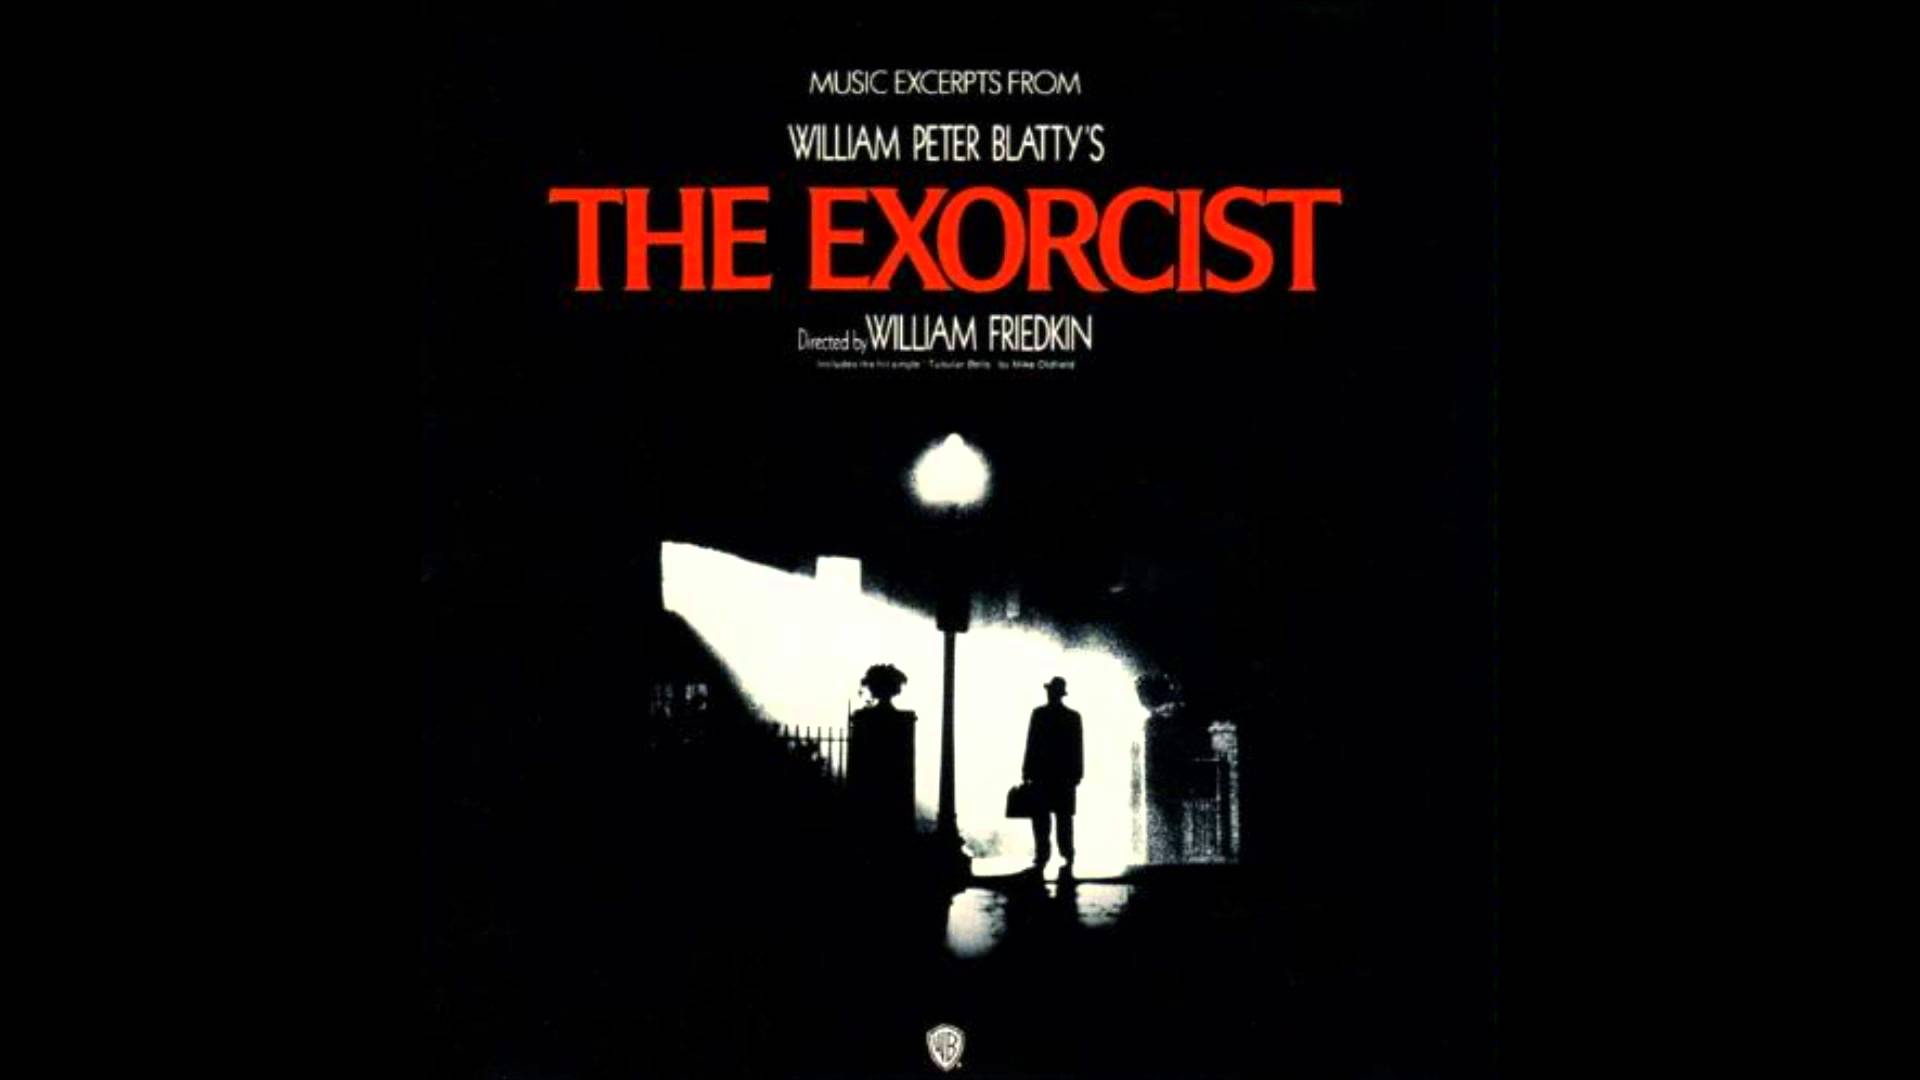 El Exorcista (The Exorcist), Filme de 1973 – Soundtrack